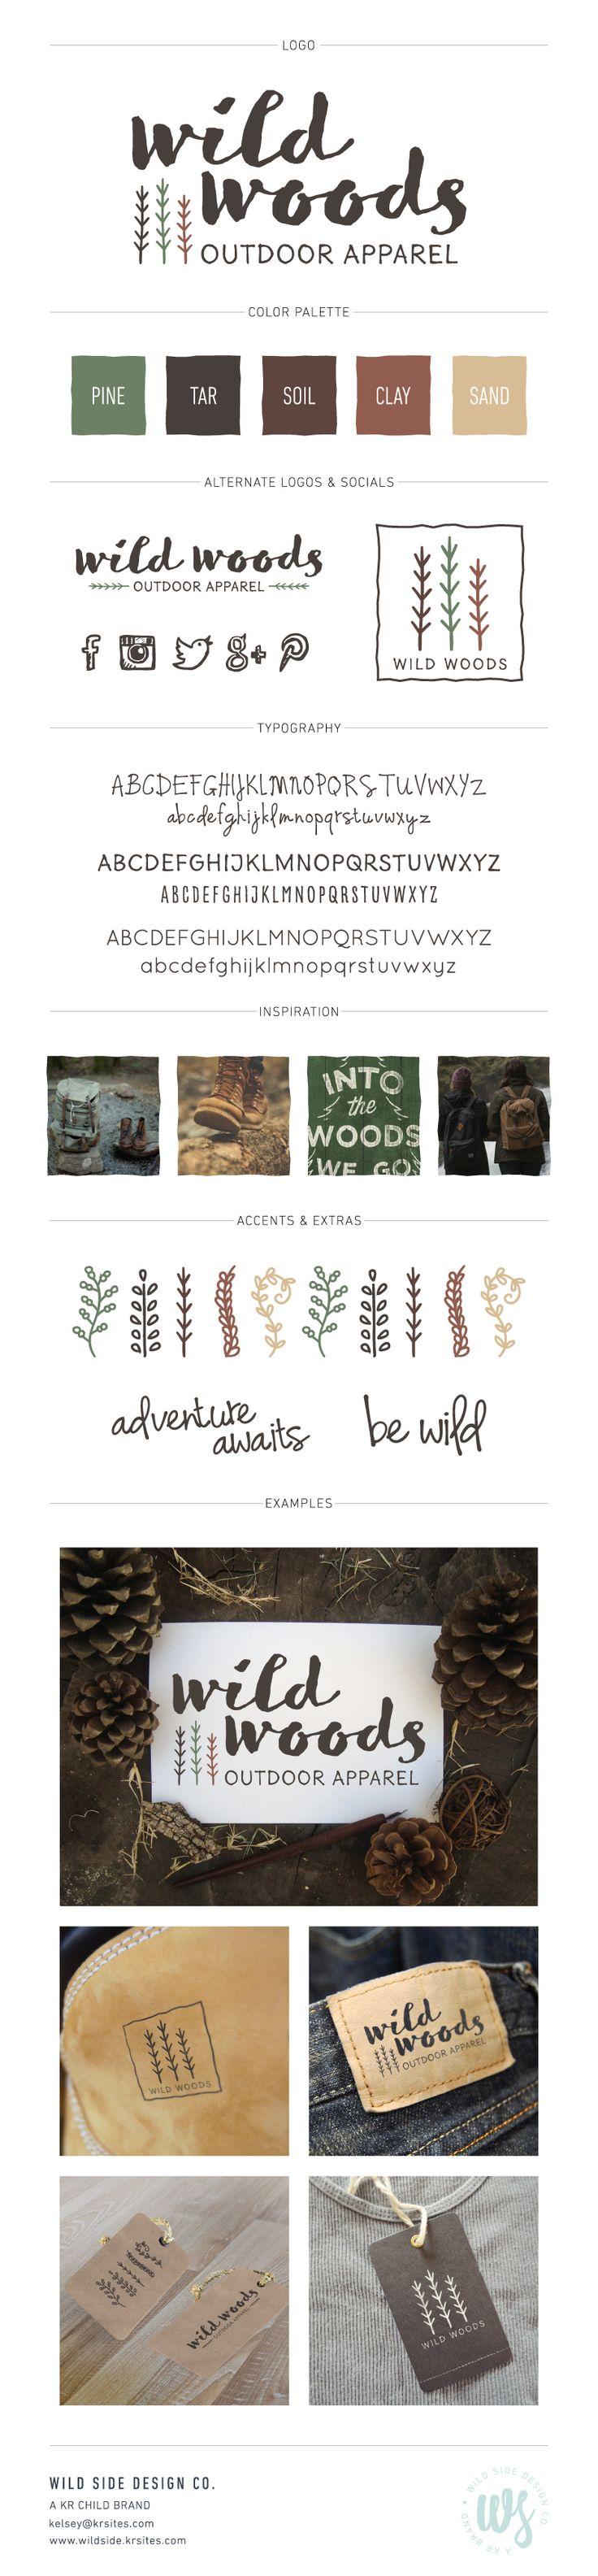 Brand Launch | Brand Style Board | Outdoor Apparel Branding | Wild Woods Brand Design by Wild Side Design Co. | #brand #print www.wildside.krsites.com